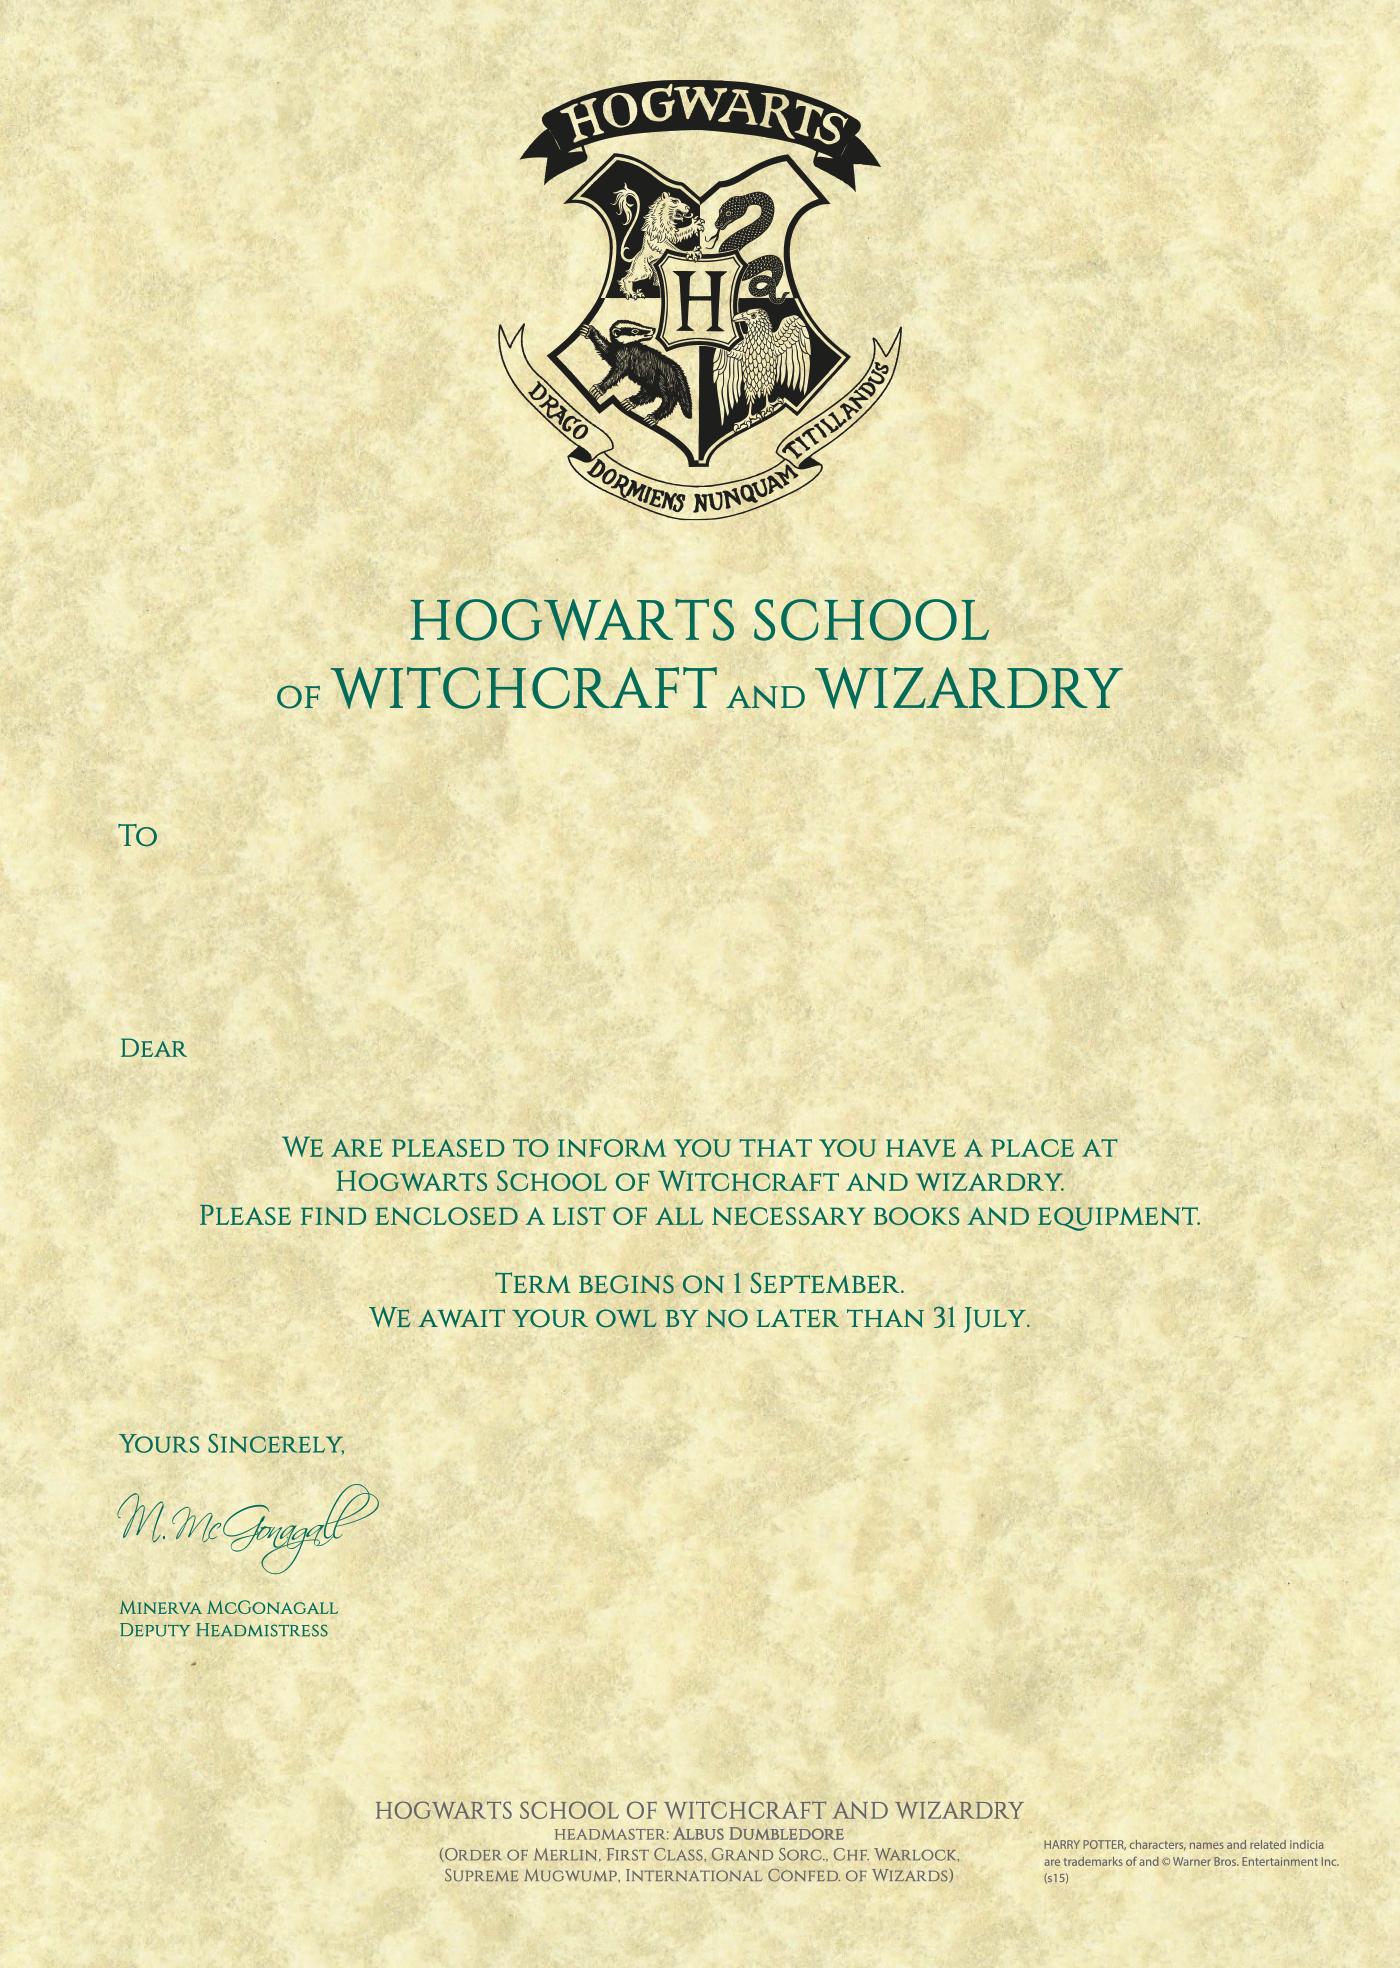 harry potter letter template  Pin by Meg Pearce on potter | Hogwarts acceptance letter ...